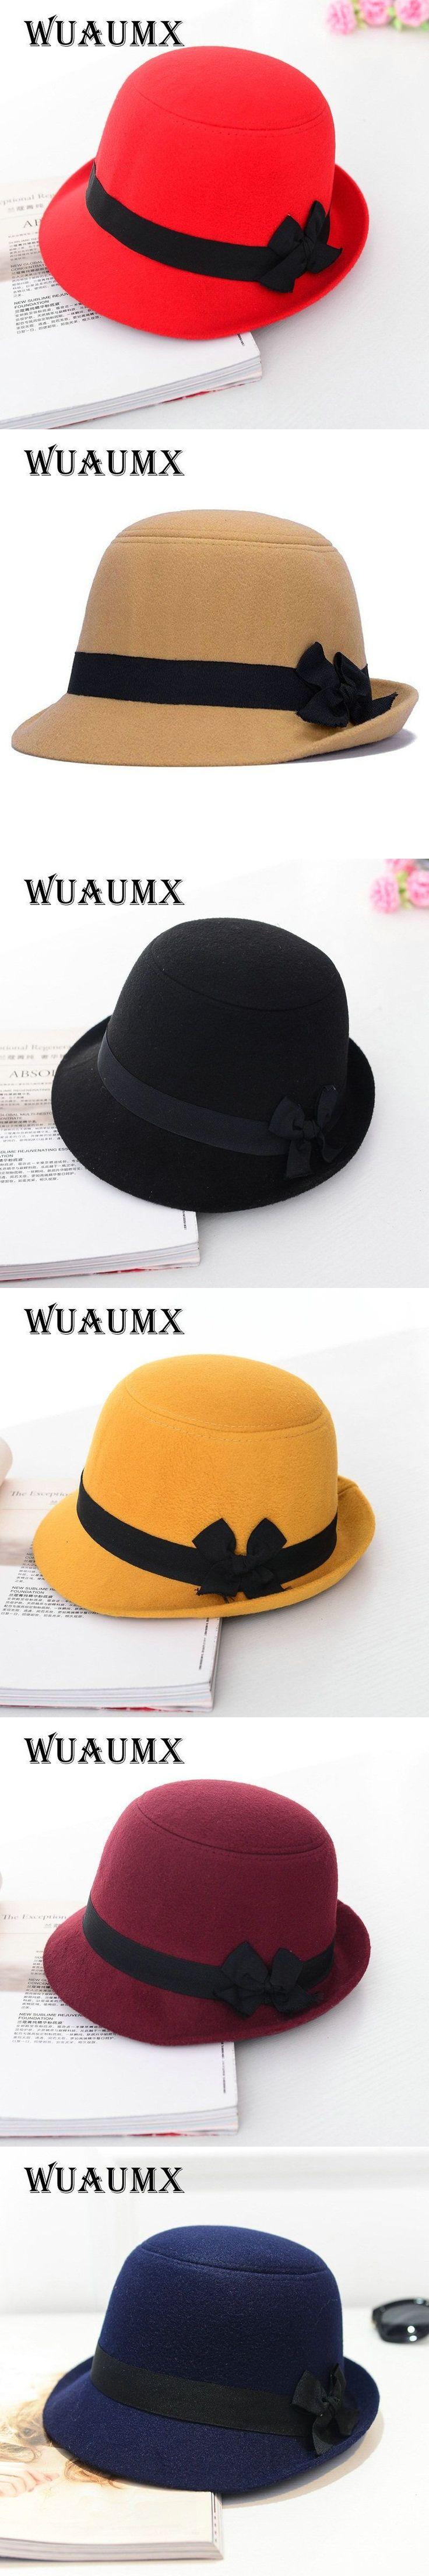 [Wuaumx] Brands Winter Fedora hats for female ladies felt top hat for girls homburg Women's hat Bowler caps chapeu masculino #HatsForWomenBowler